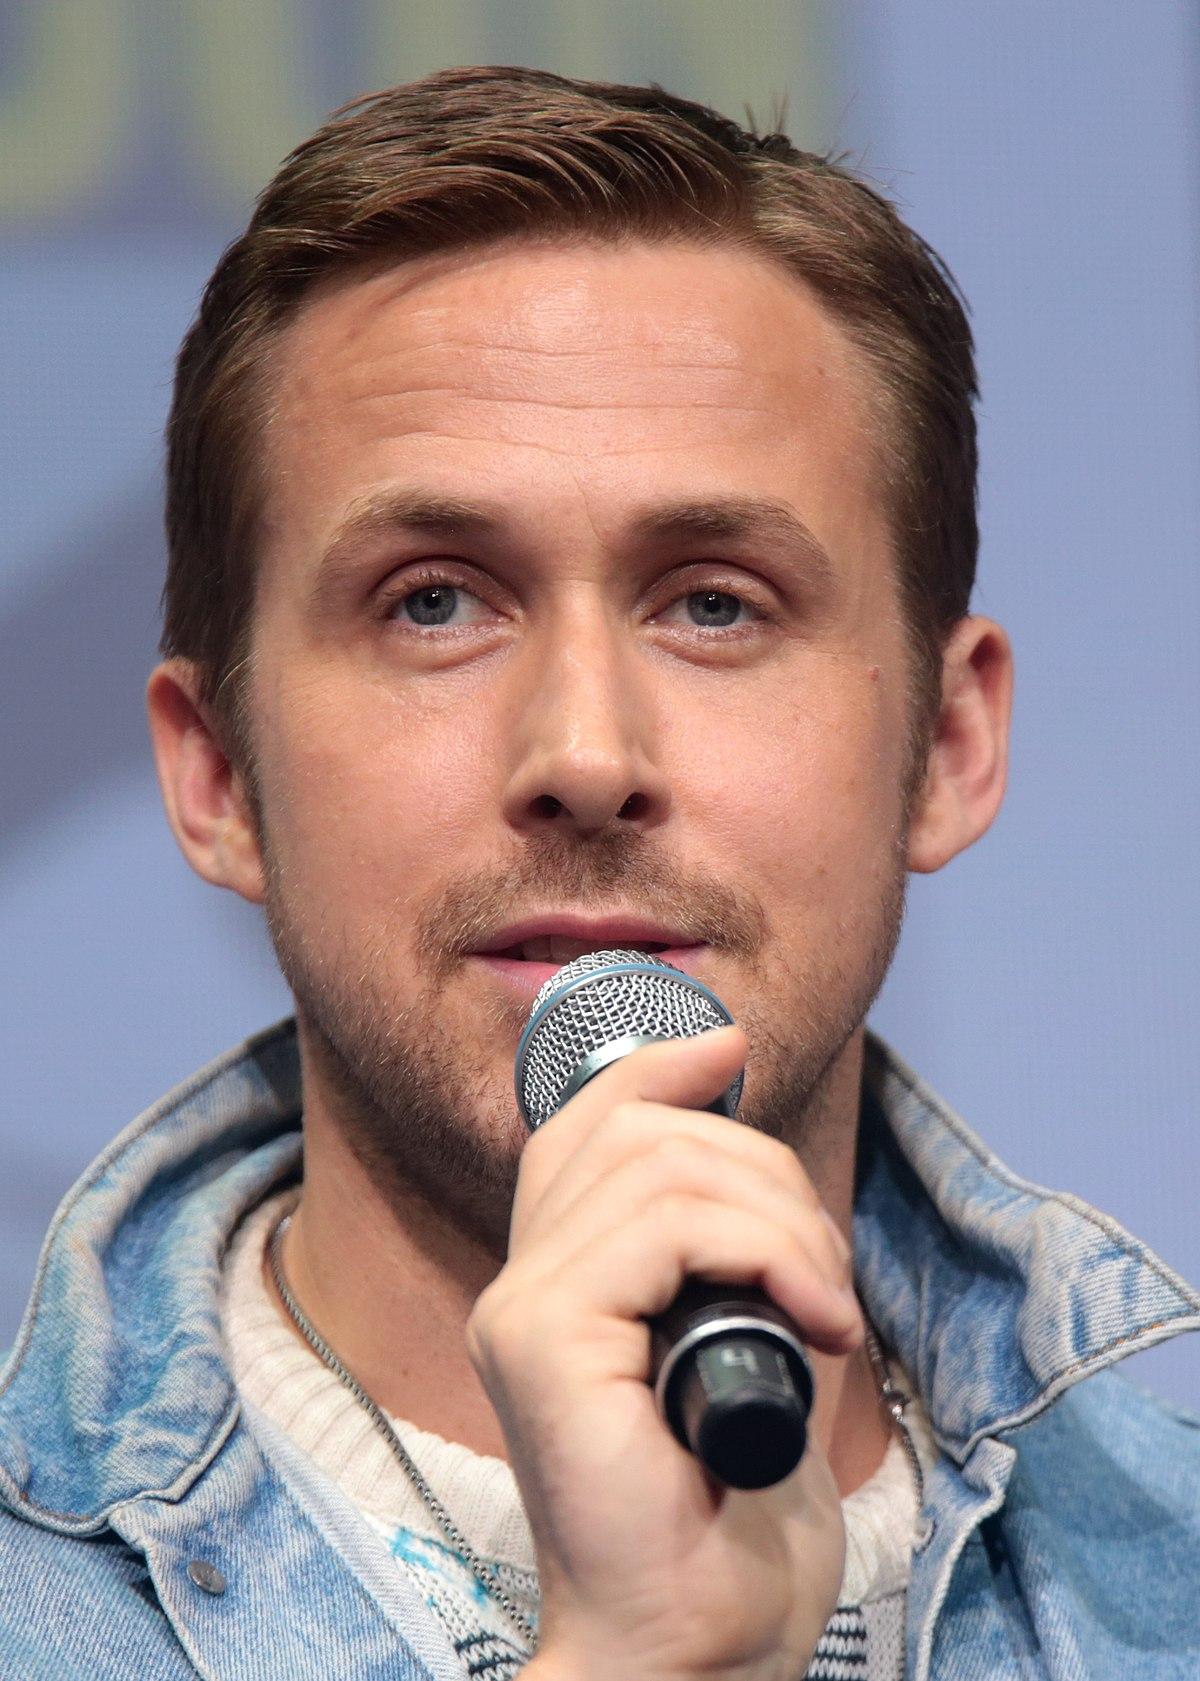 Ryan Gosling - Wikipedia